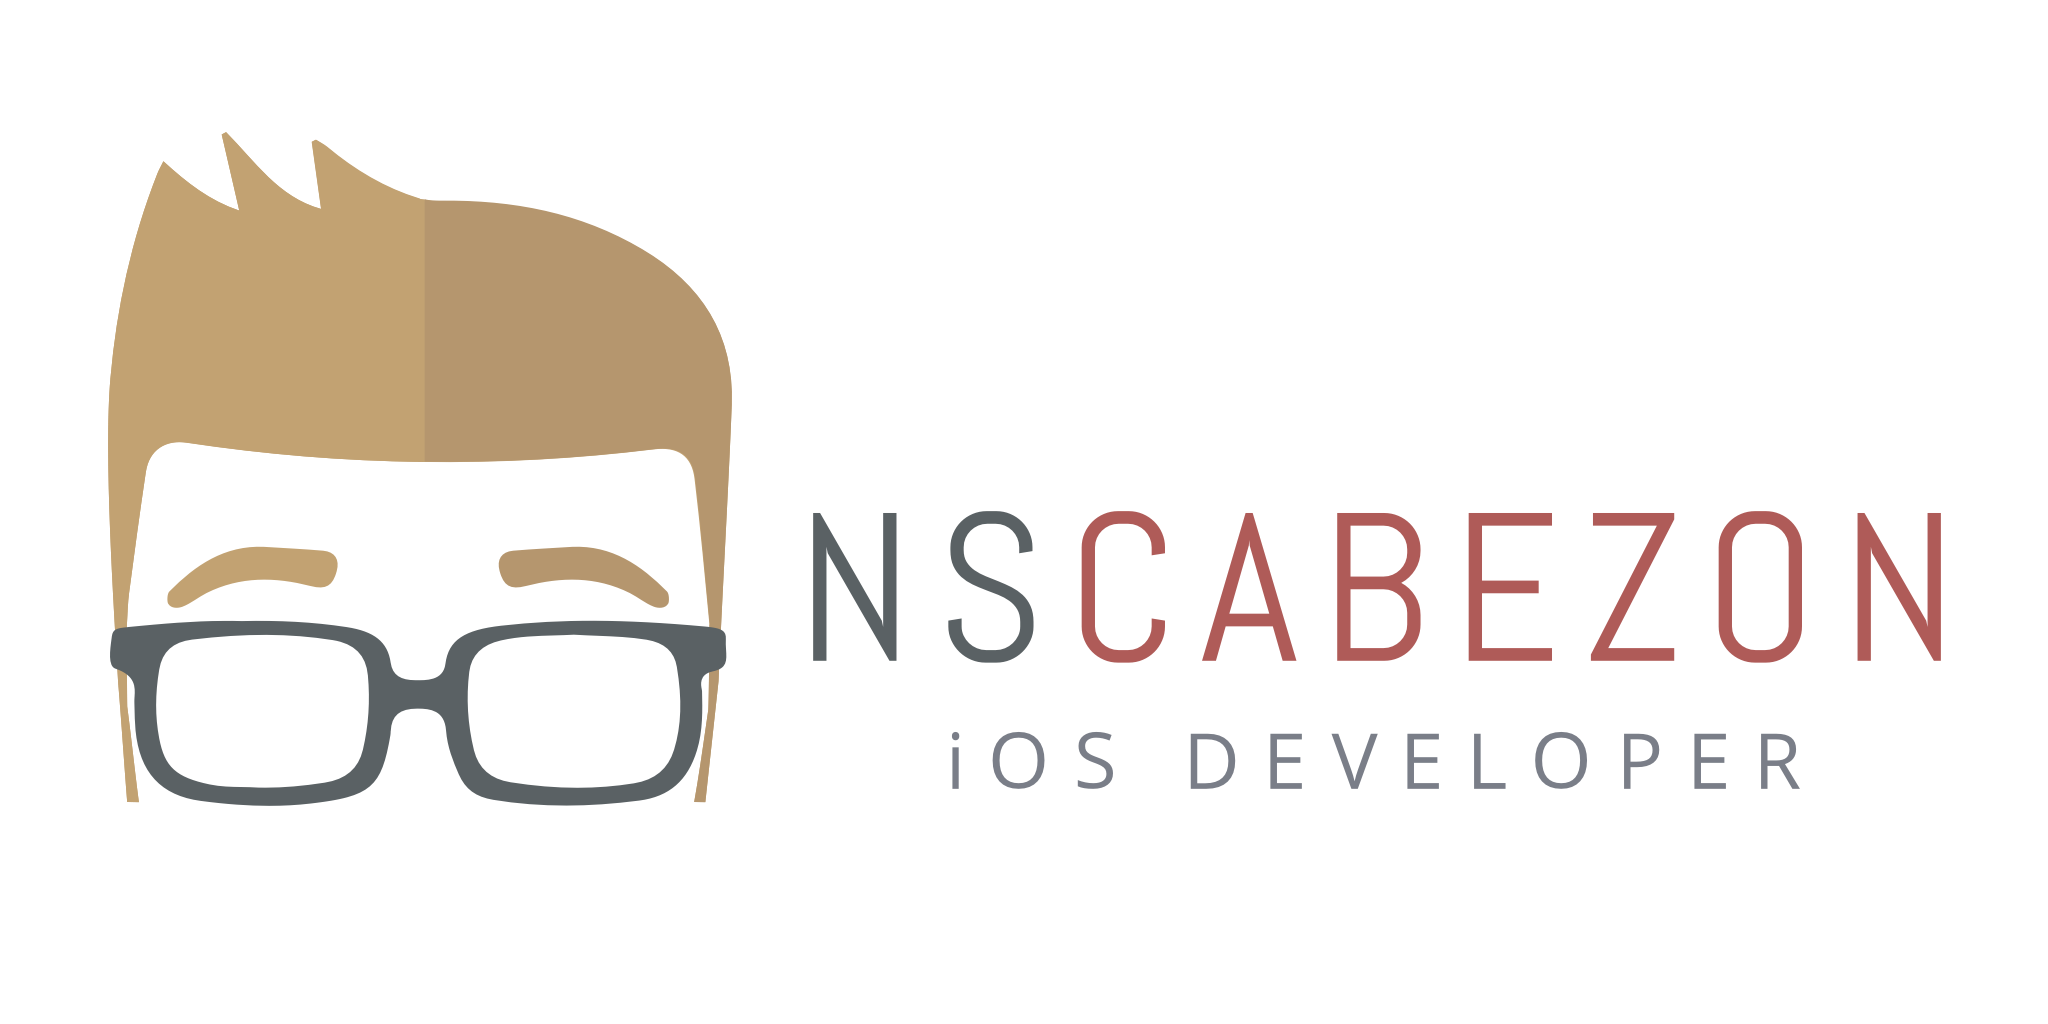 NSCabezon's Blog